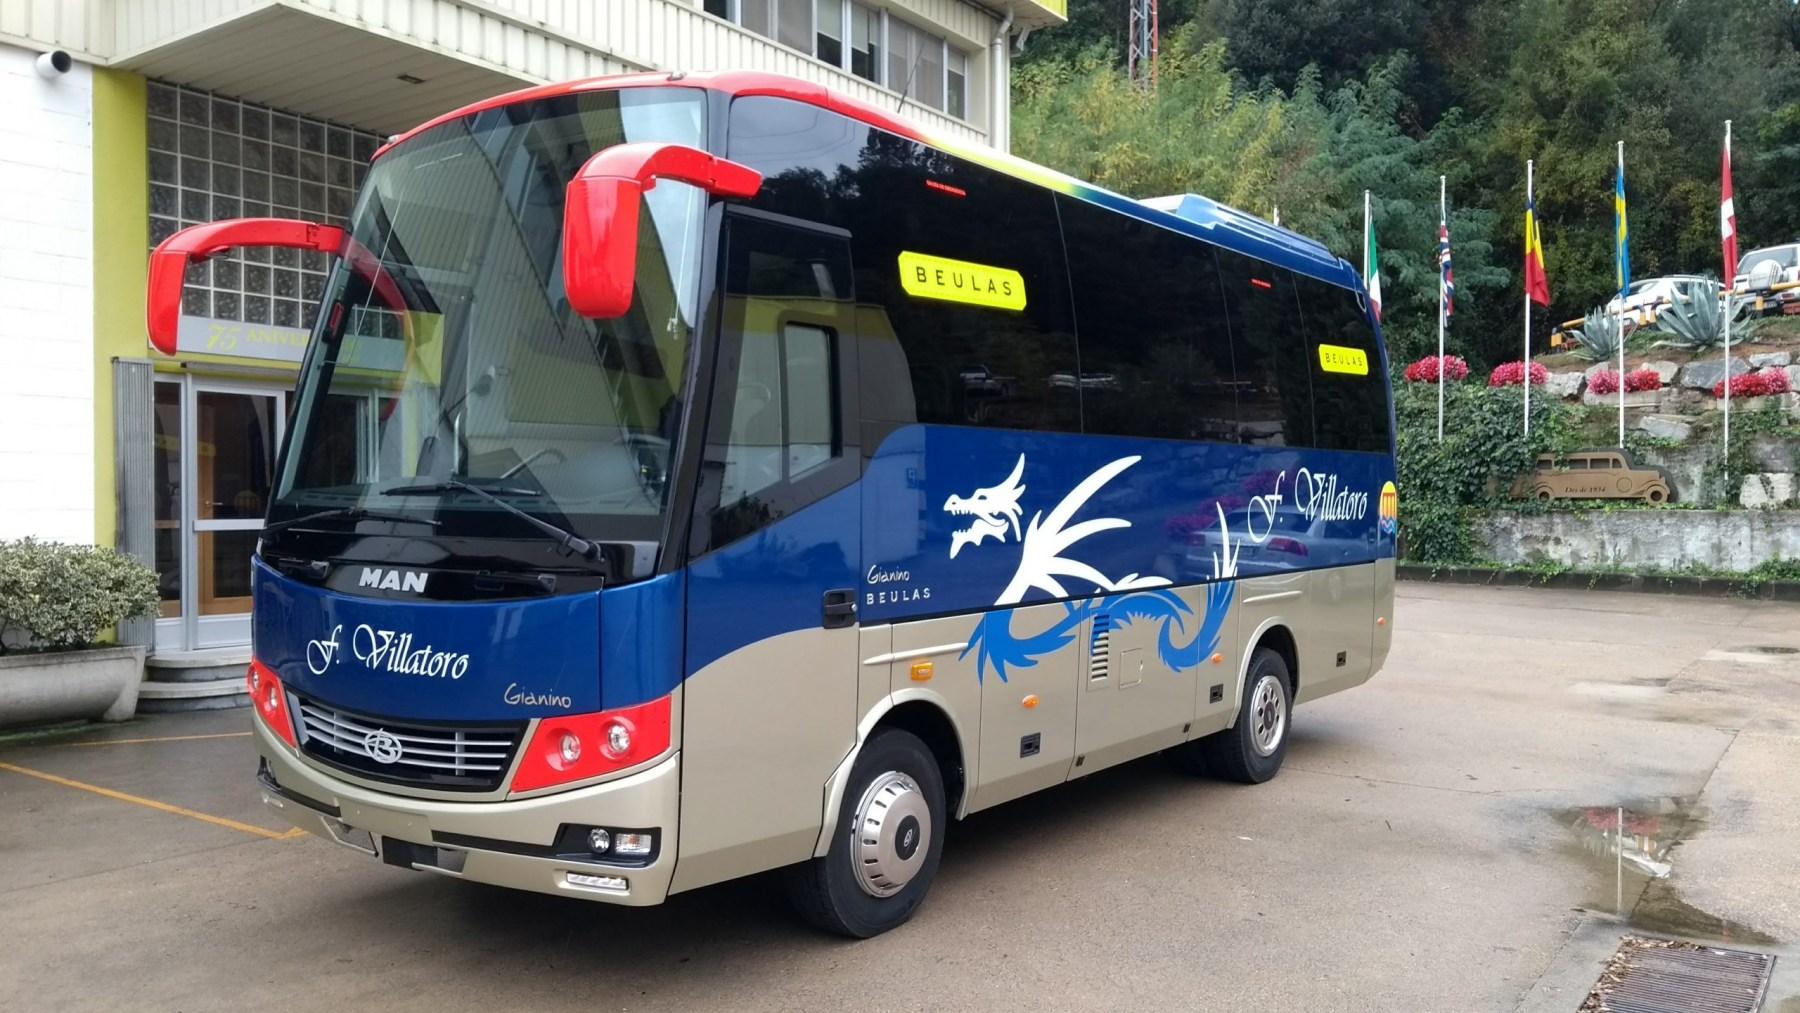 Autocares-Villatoro-nuevo-Beulas-Gianino-2-scaled